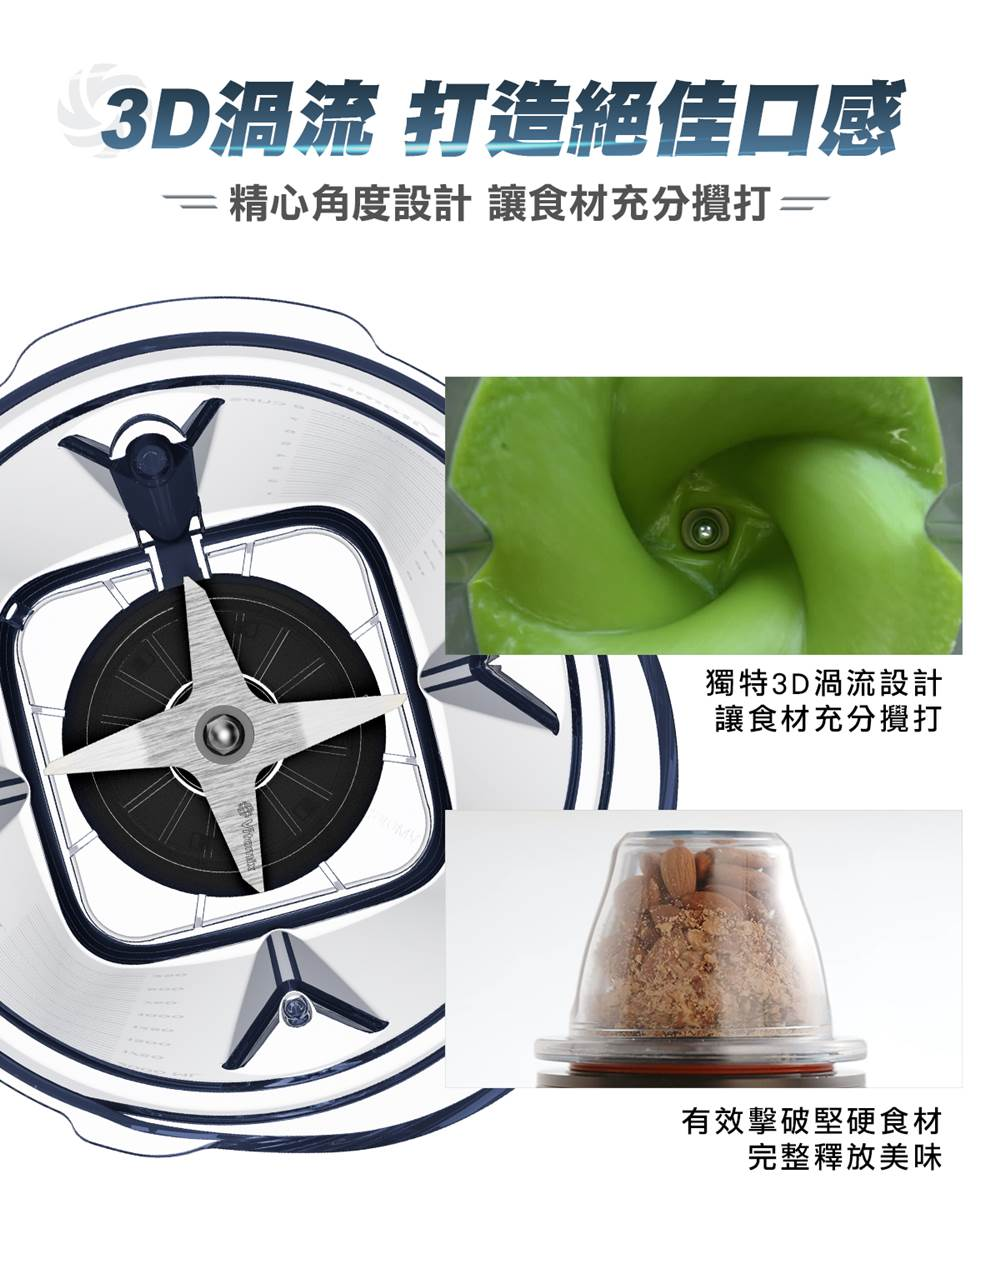 Vitamix-A3500i超跑級調理機-Ascent-3D渦流設計_釋放完整美味